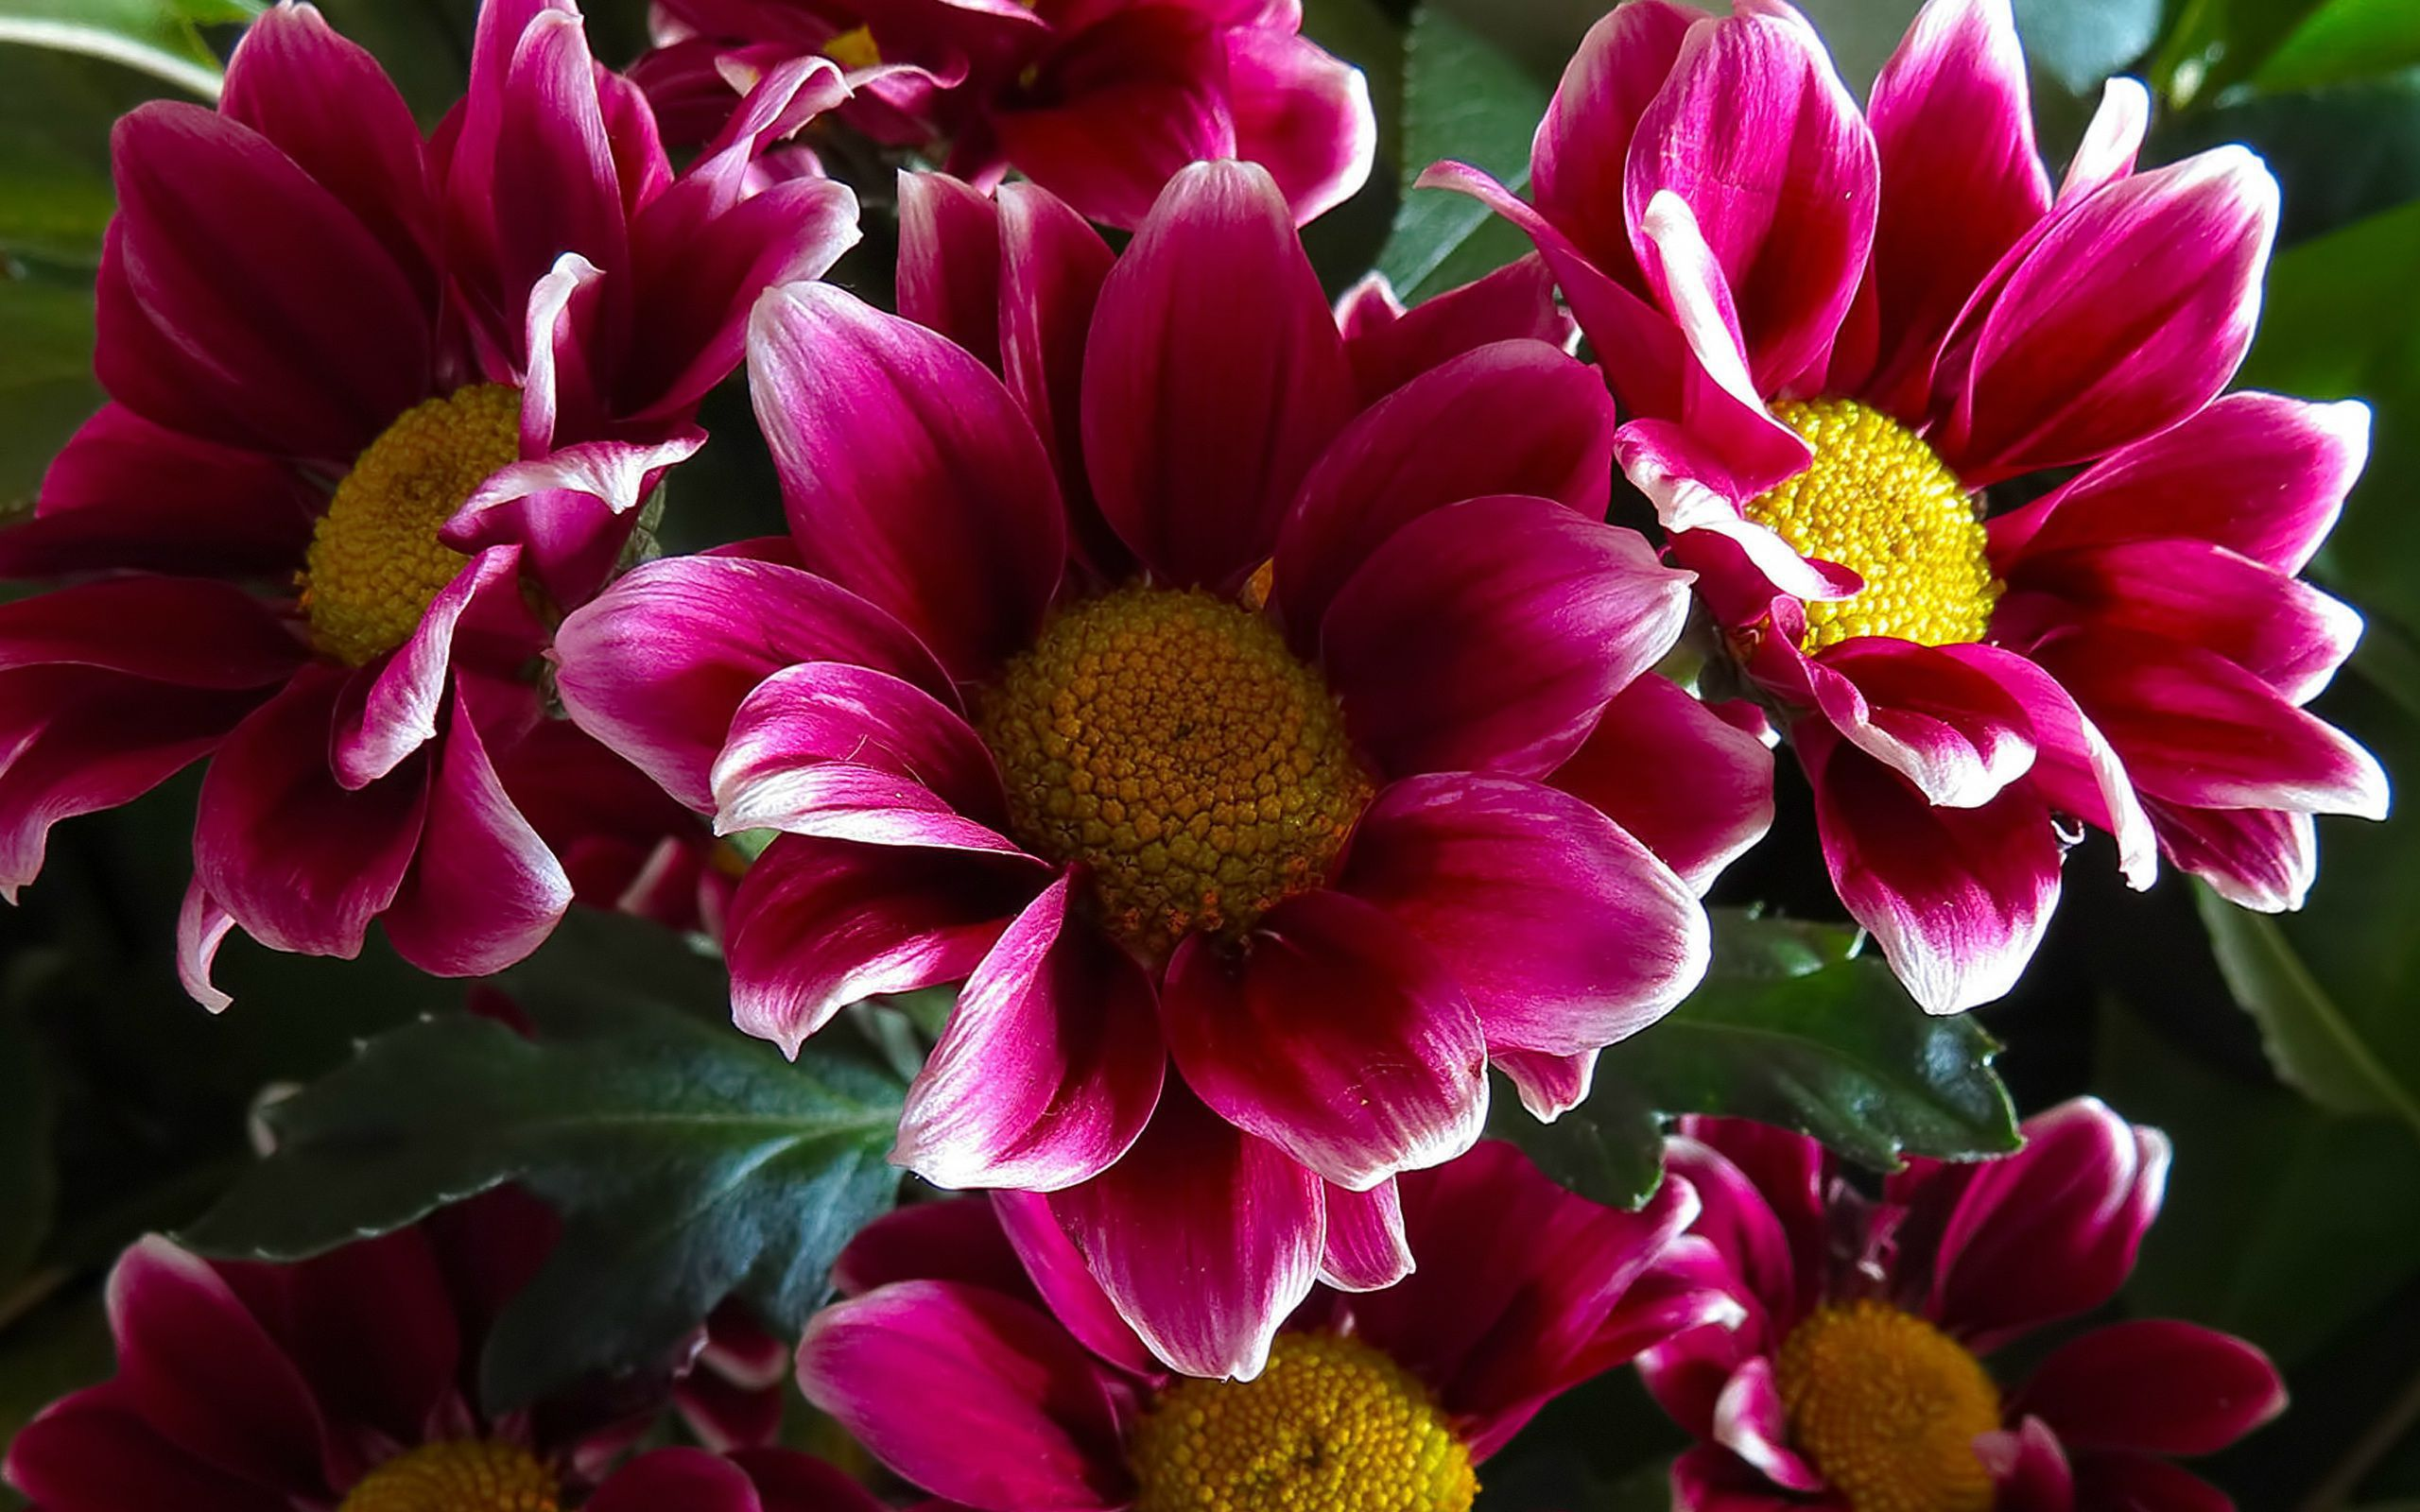 Vintage Flowers Widescreen